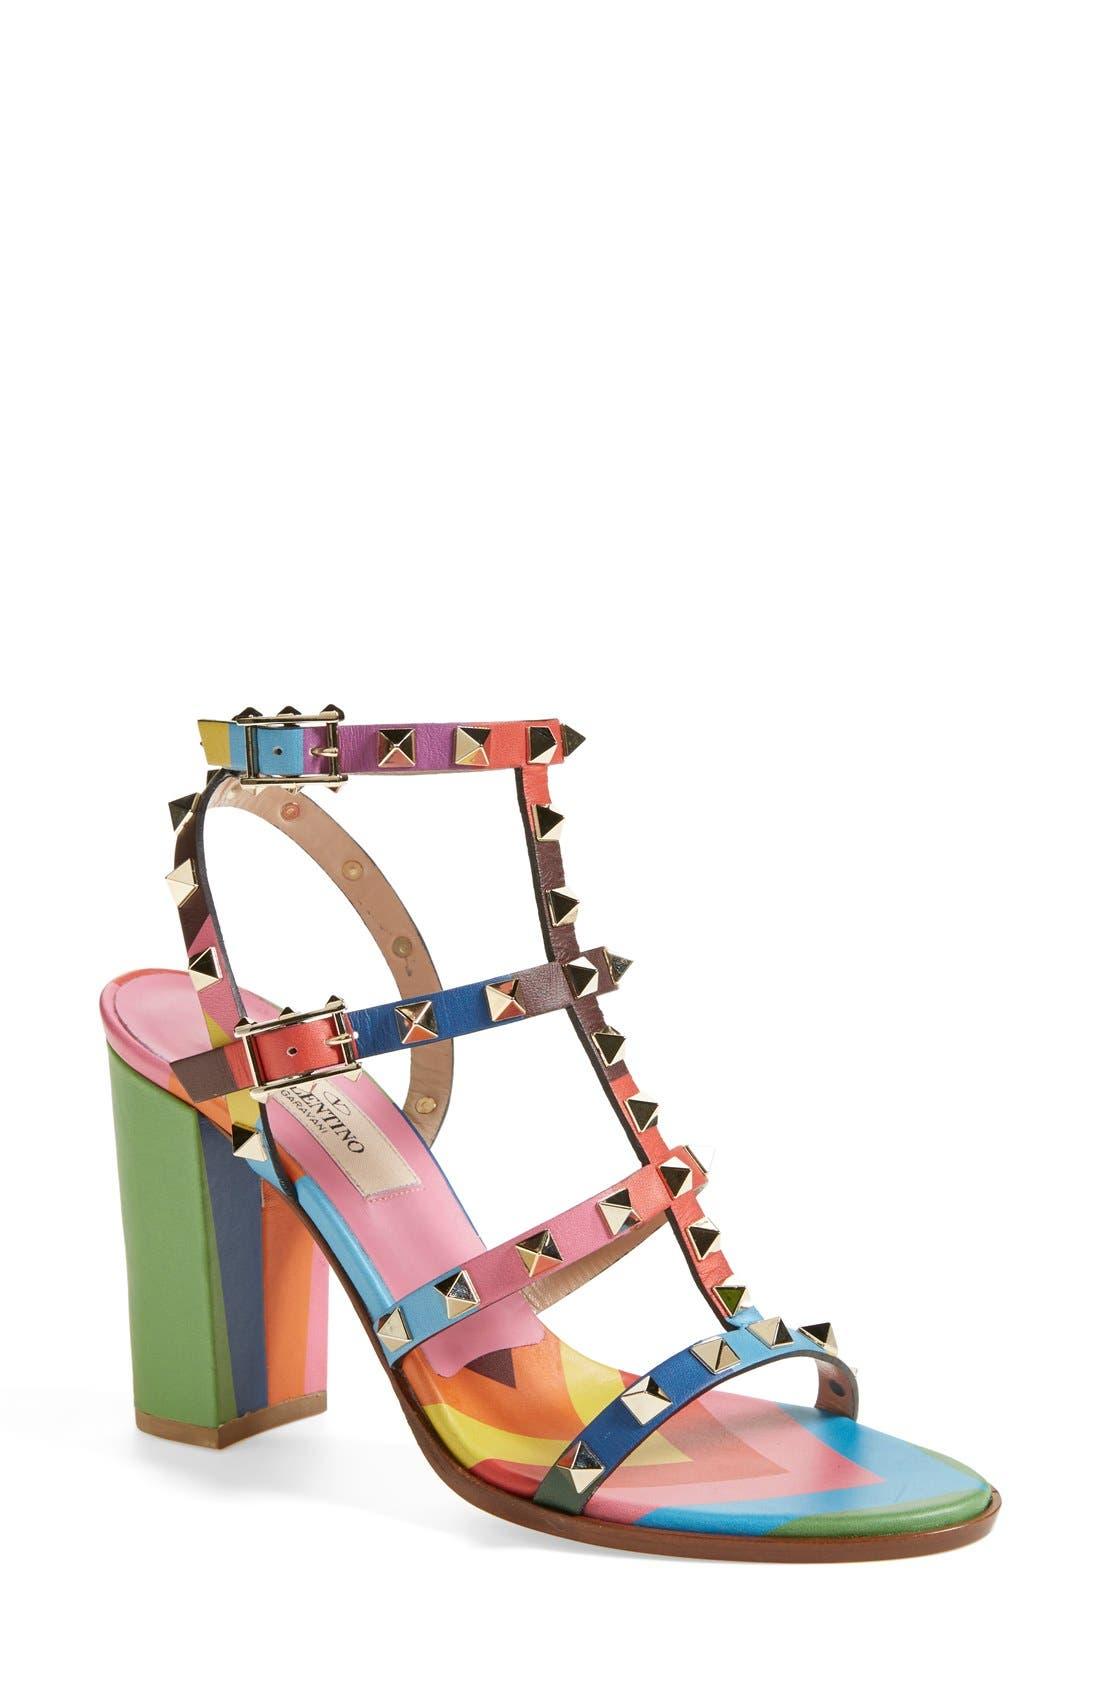 Main Image - Valentino 'Rockstud' T-Strap Sandal (Women)